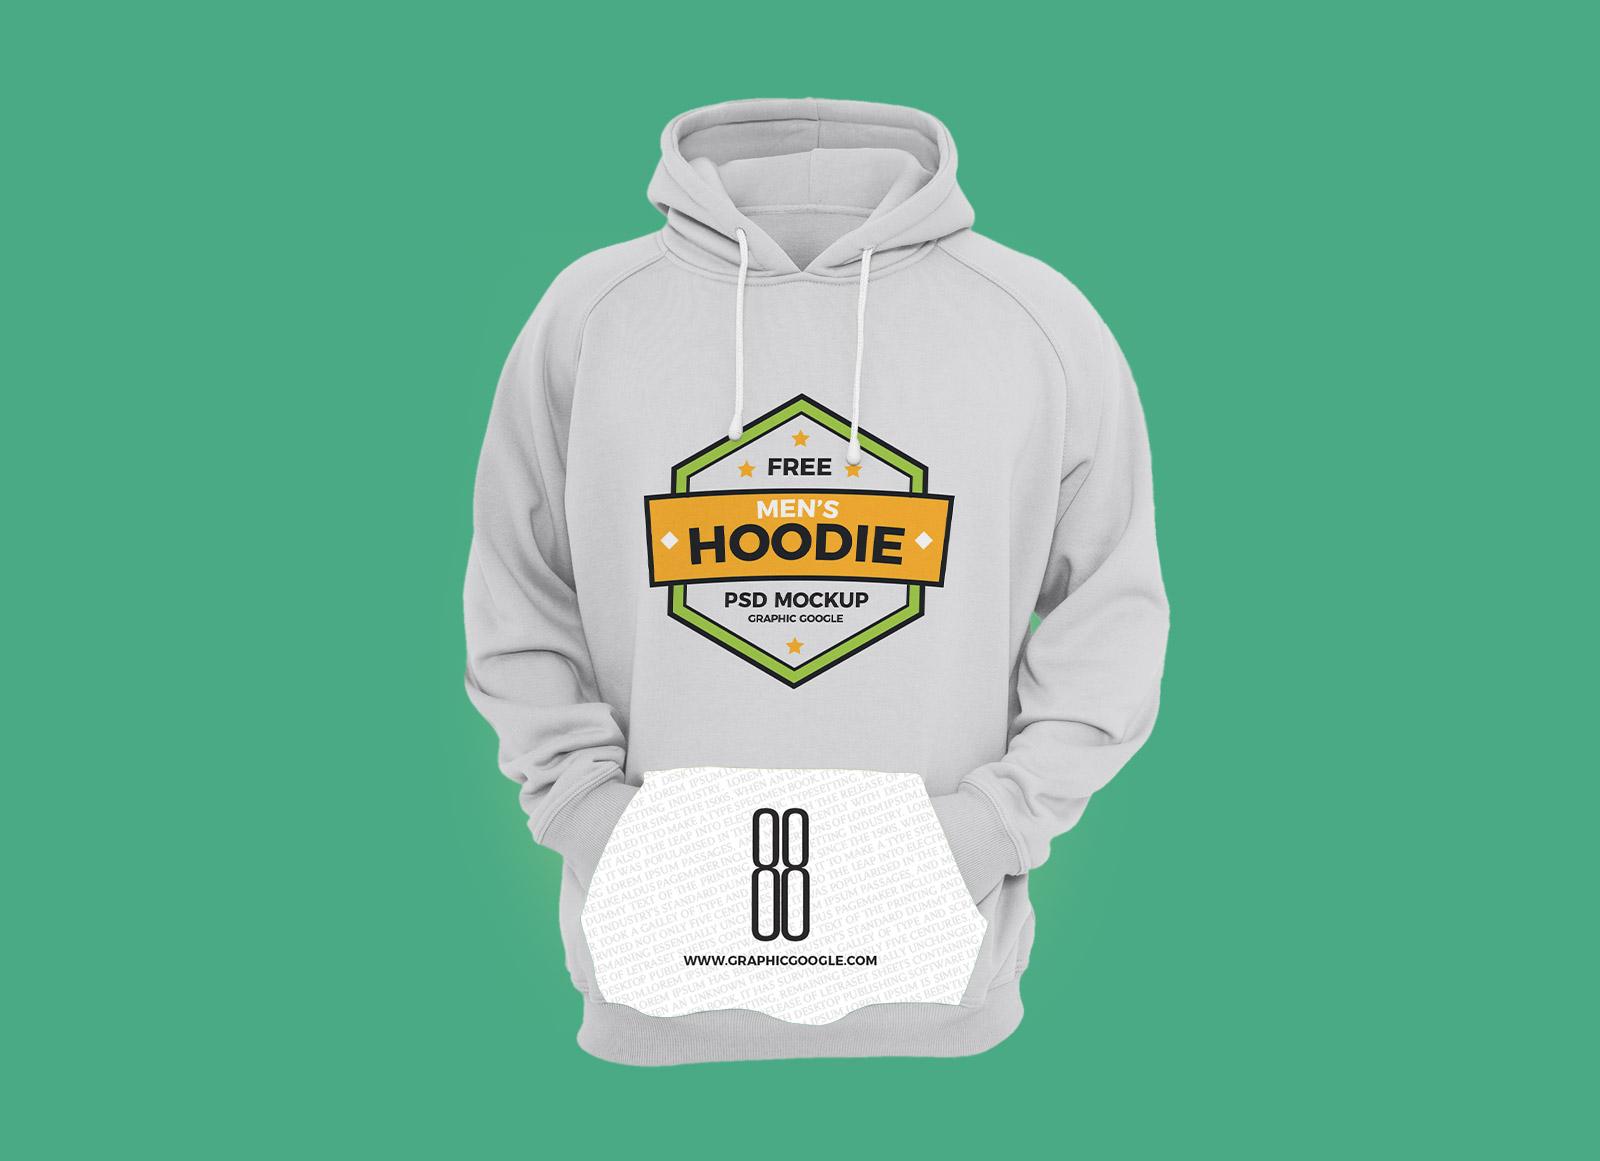 Download Free Men's Hoodie T-shirt Mockup PSD File - Good Mockups